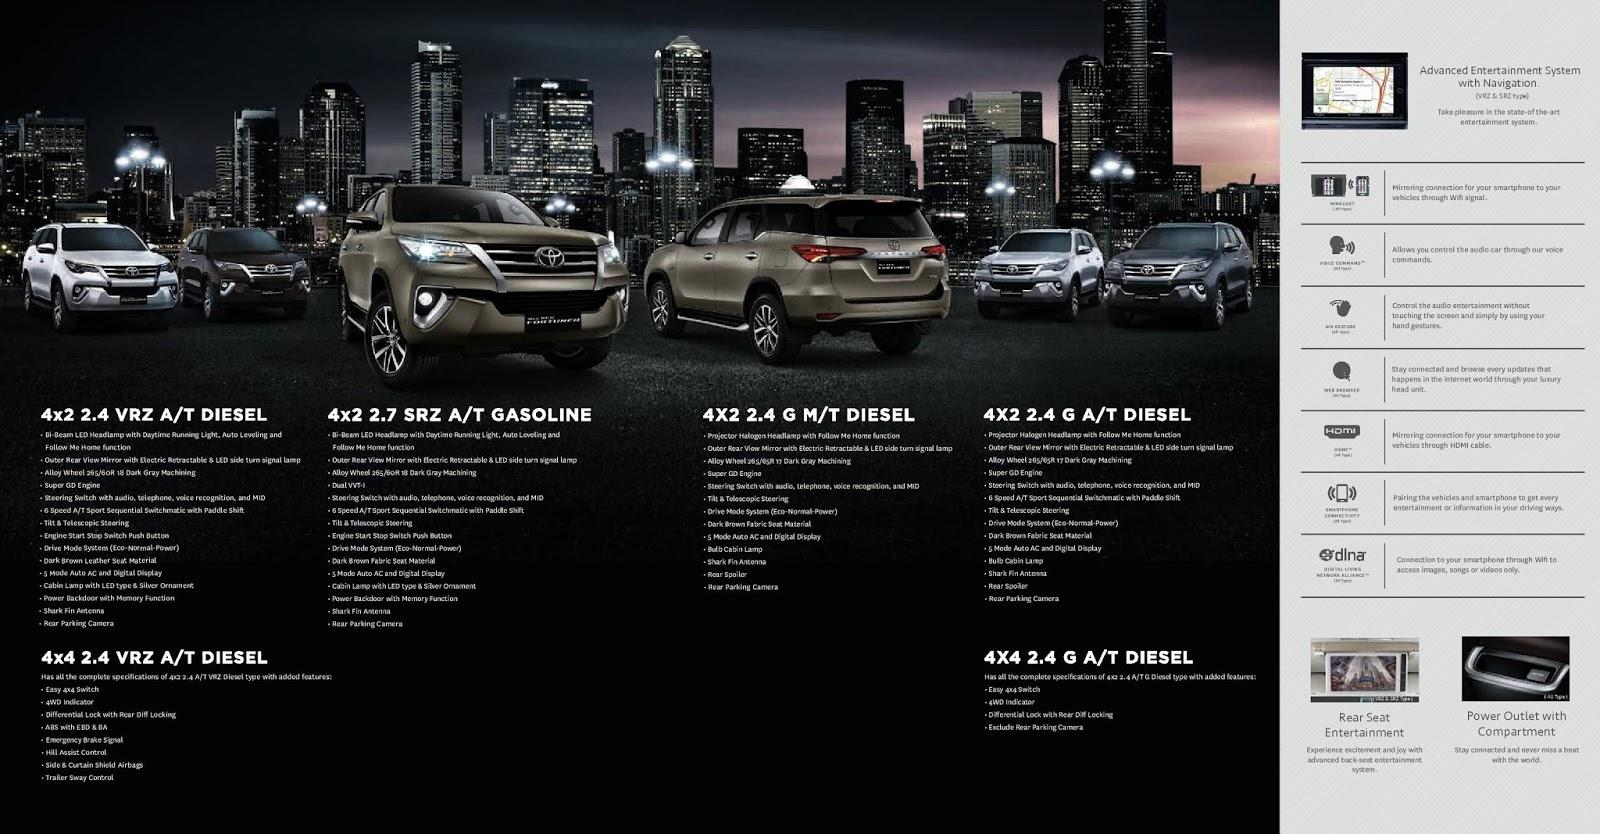 Brosur Grand New Avanza 2018 Toyota Yaris 2017 Trd Parts All Fortuner Promo Jakarta